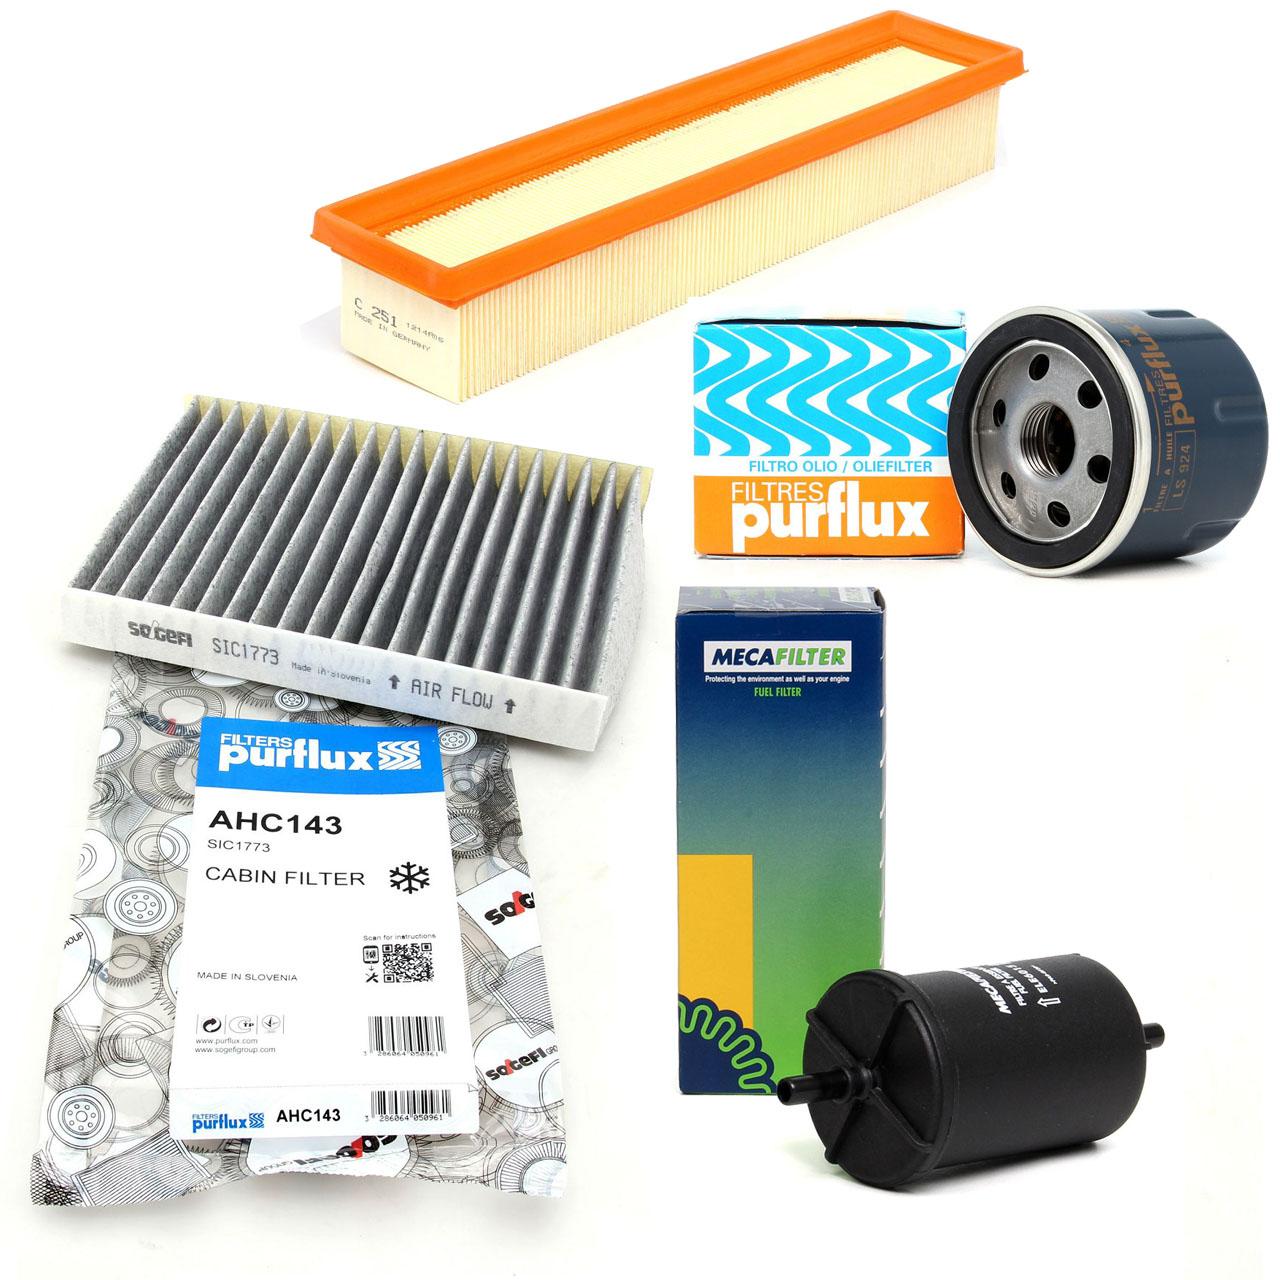 Inspektionskit Filterpaket Filterset für Renault Clio II Kangoo 1.2 16V 75 PS